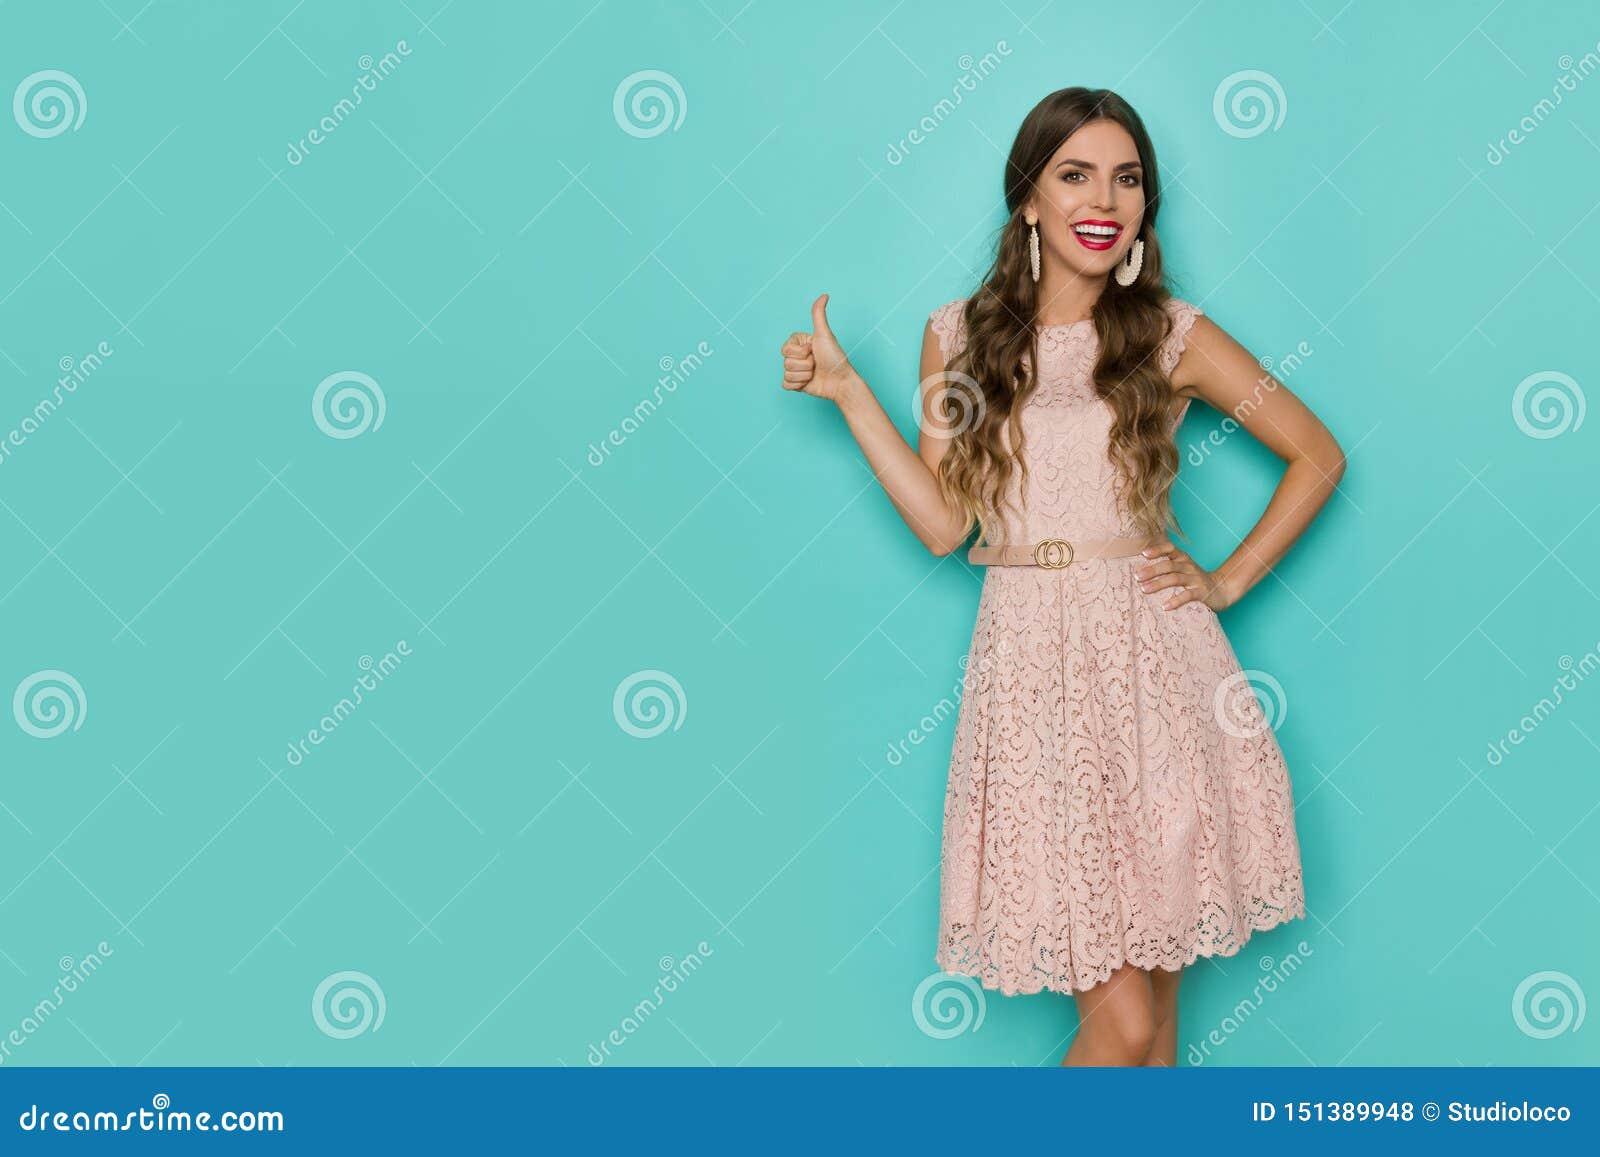 Glimlachende Mooie Vrouw in Beige Kant Mini Dress Is Showing Thumb omhoog